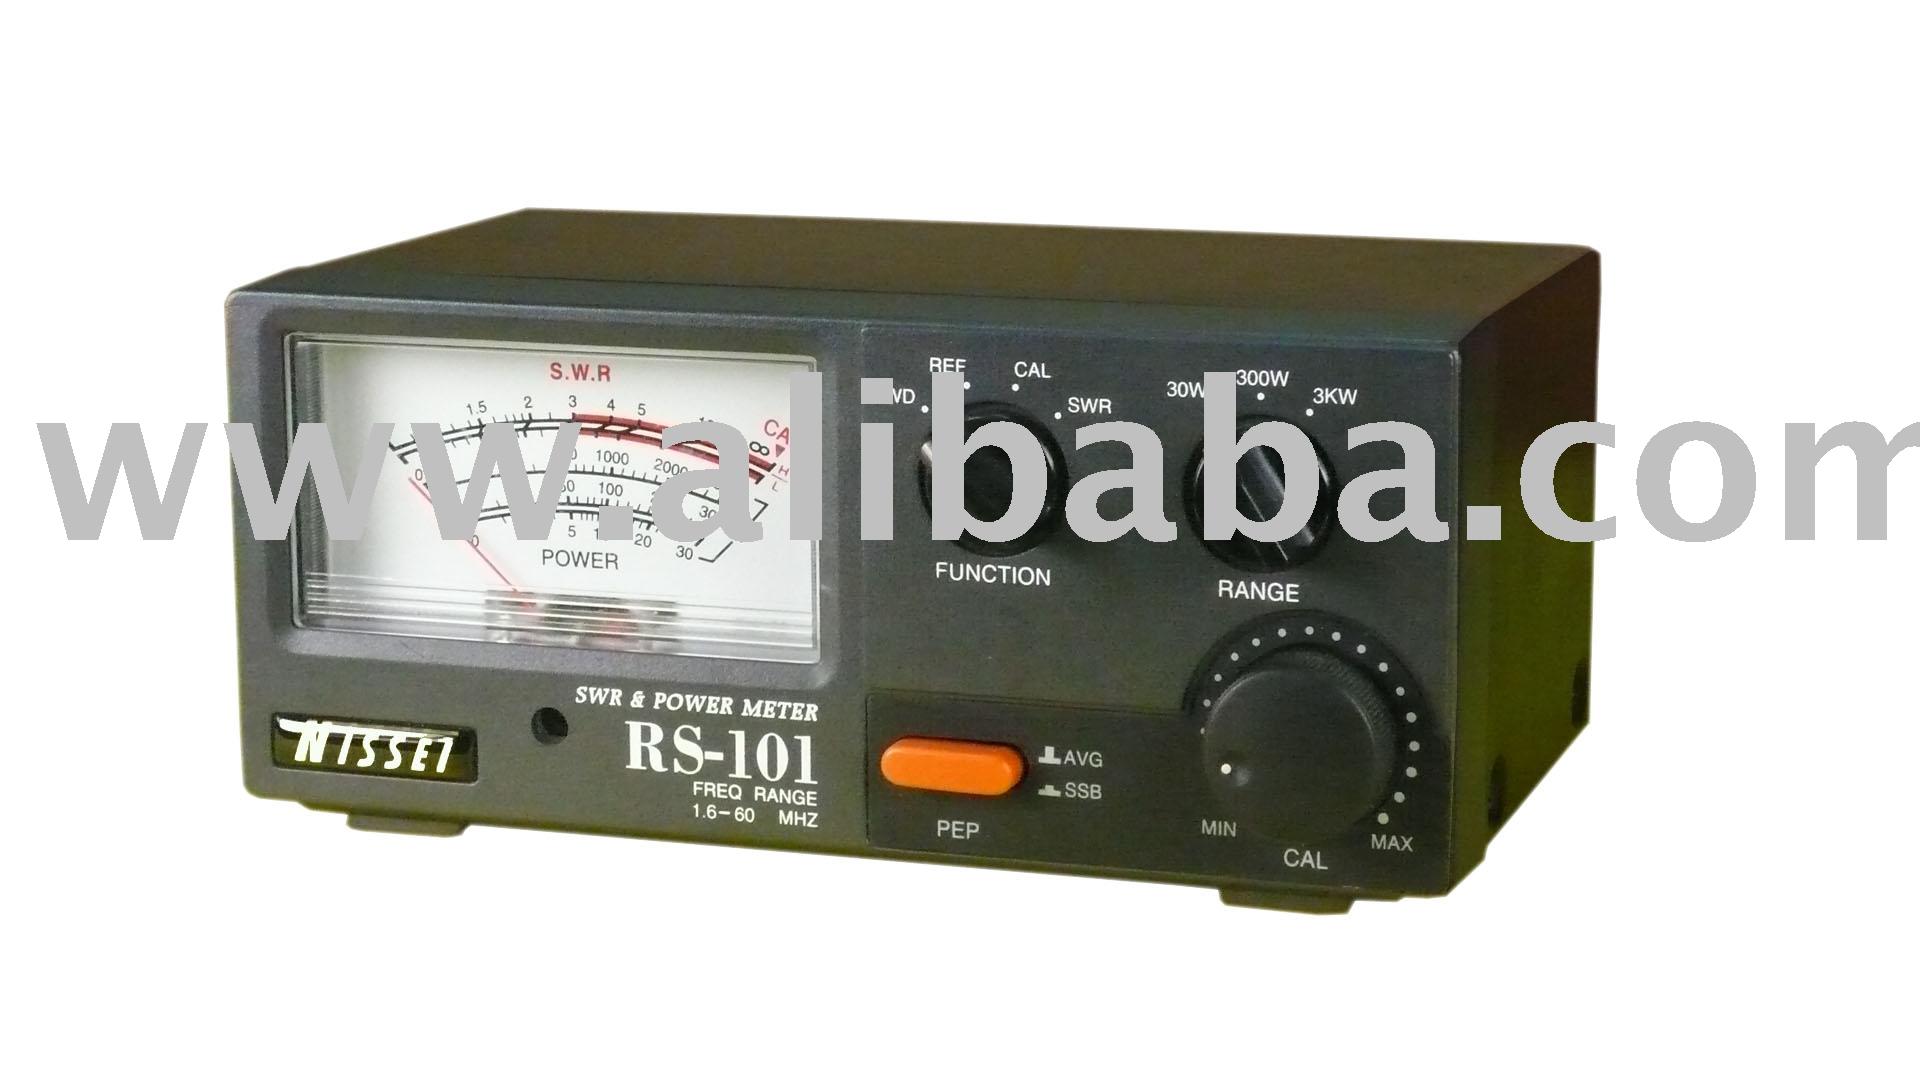 инструкция по эксплуатации ксв-метра nissei rs-101